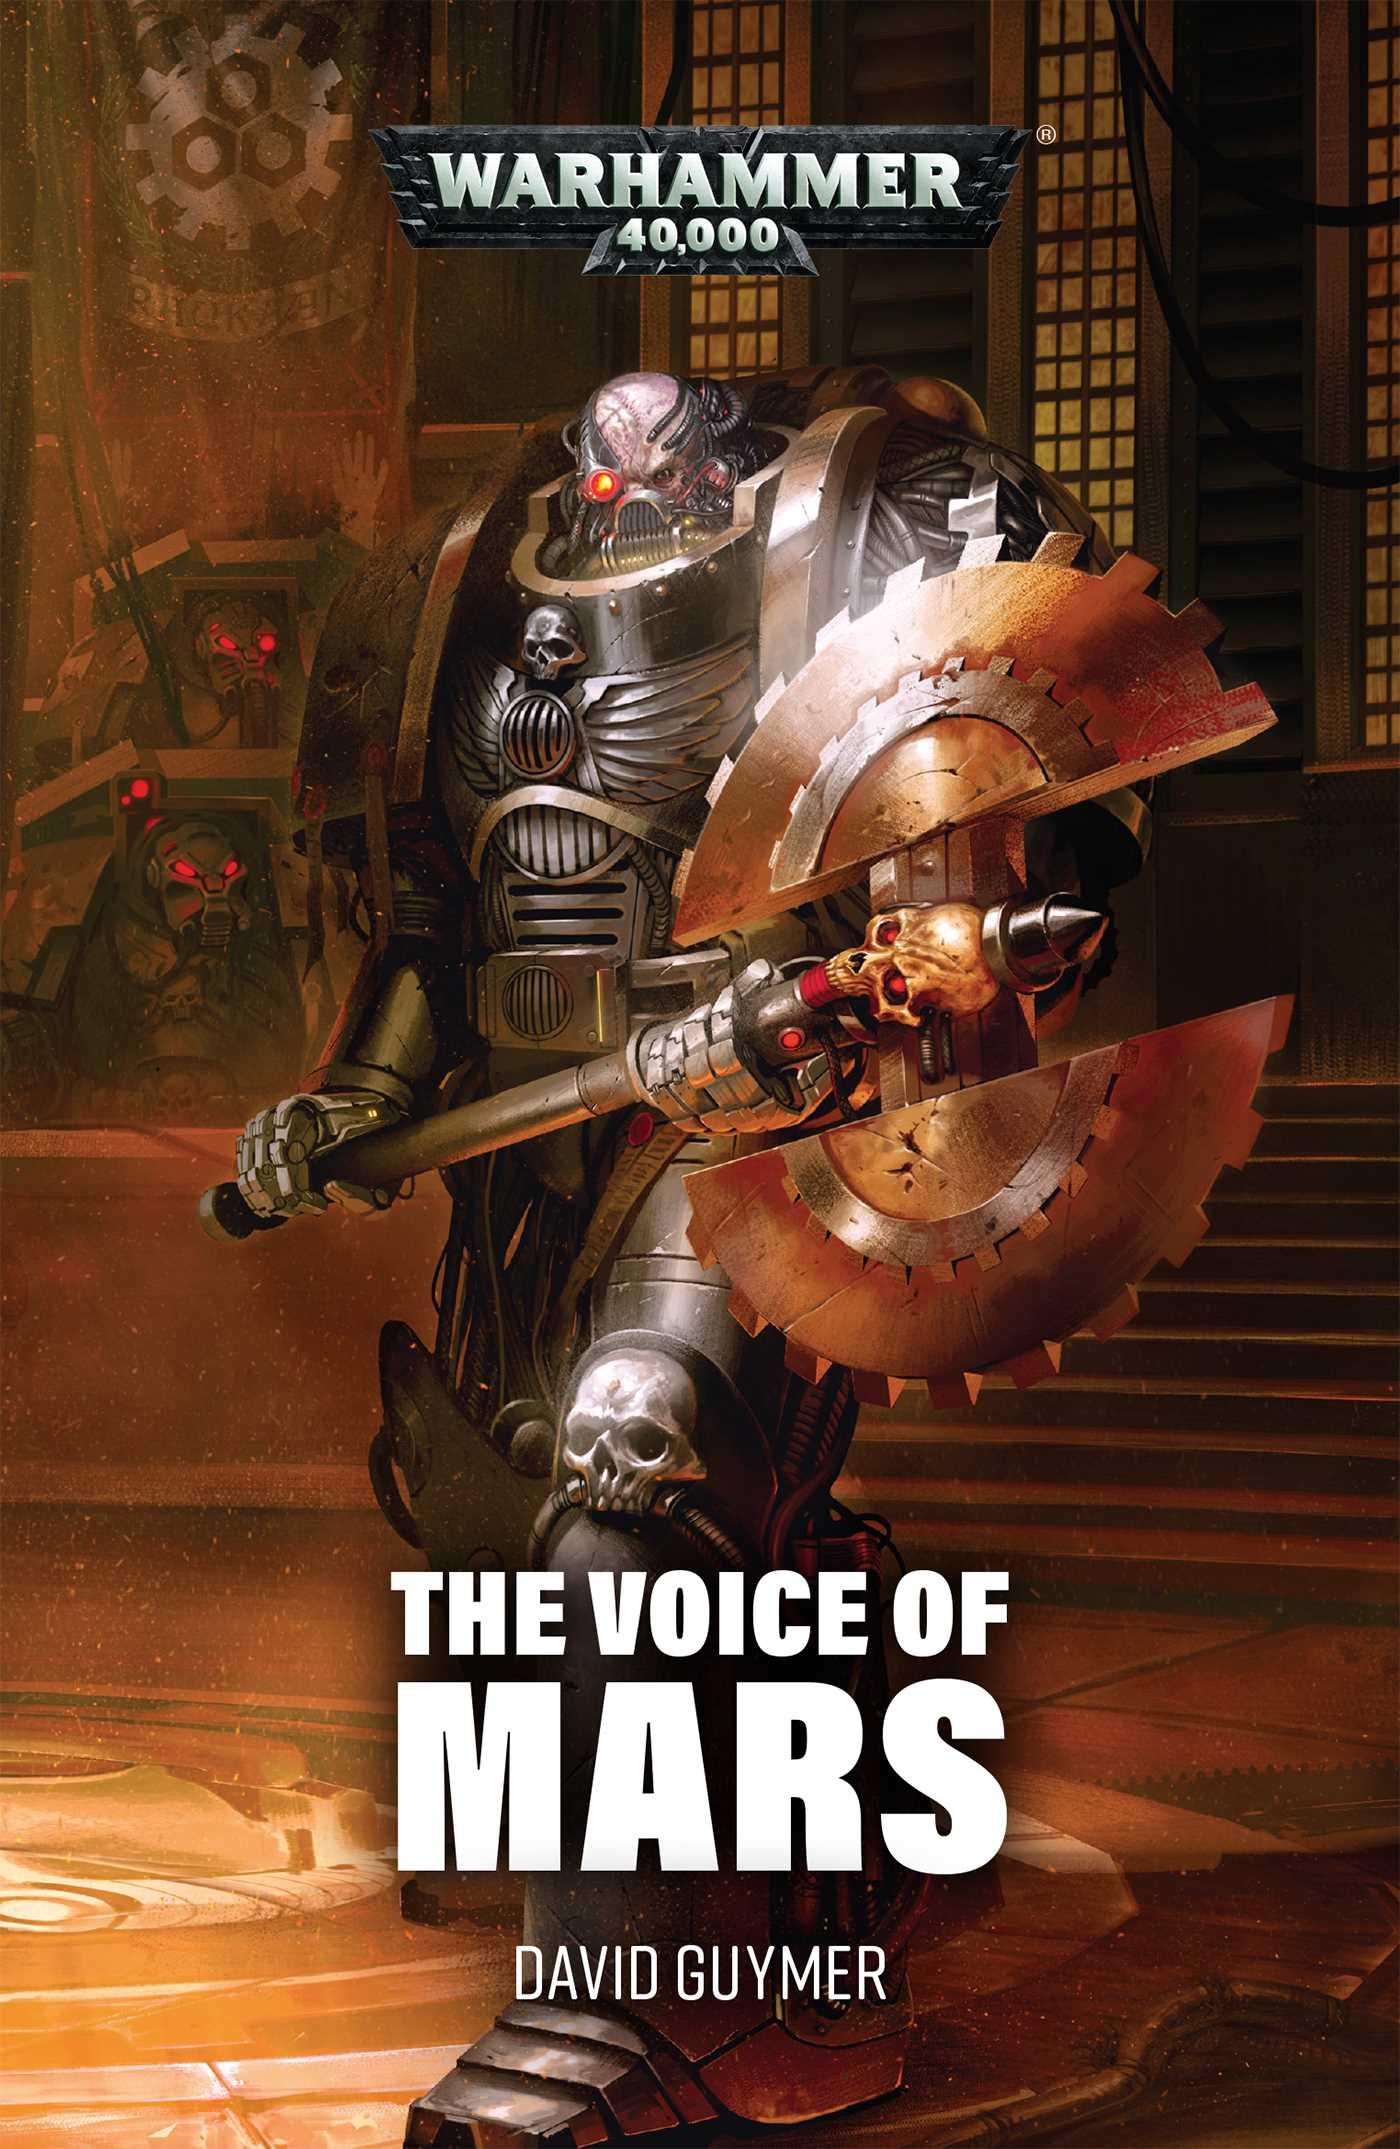 The voice of mars 9781784968083 hr